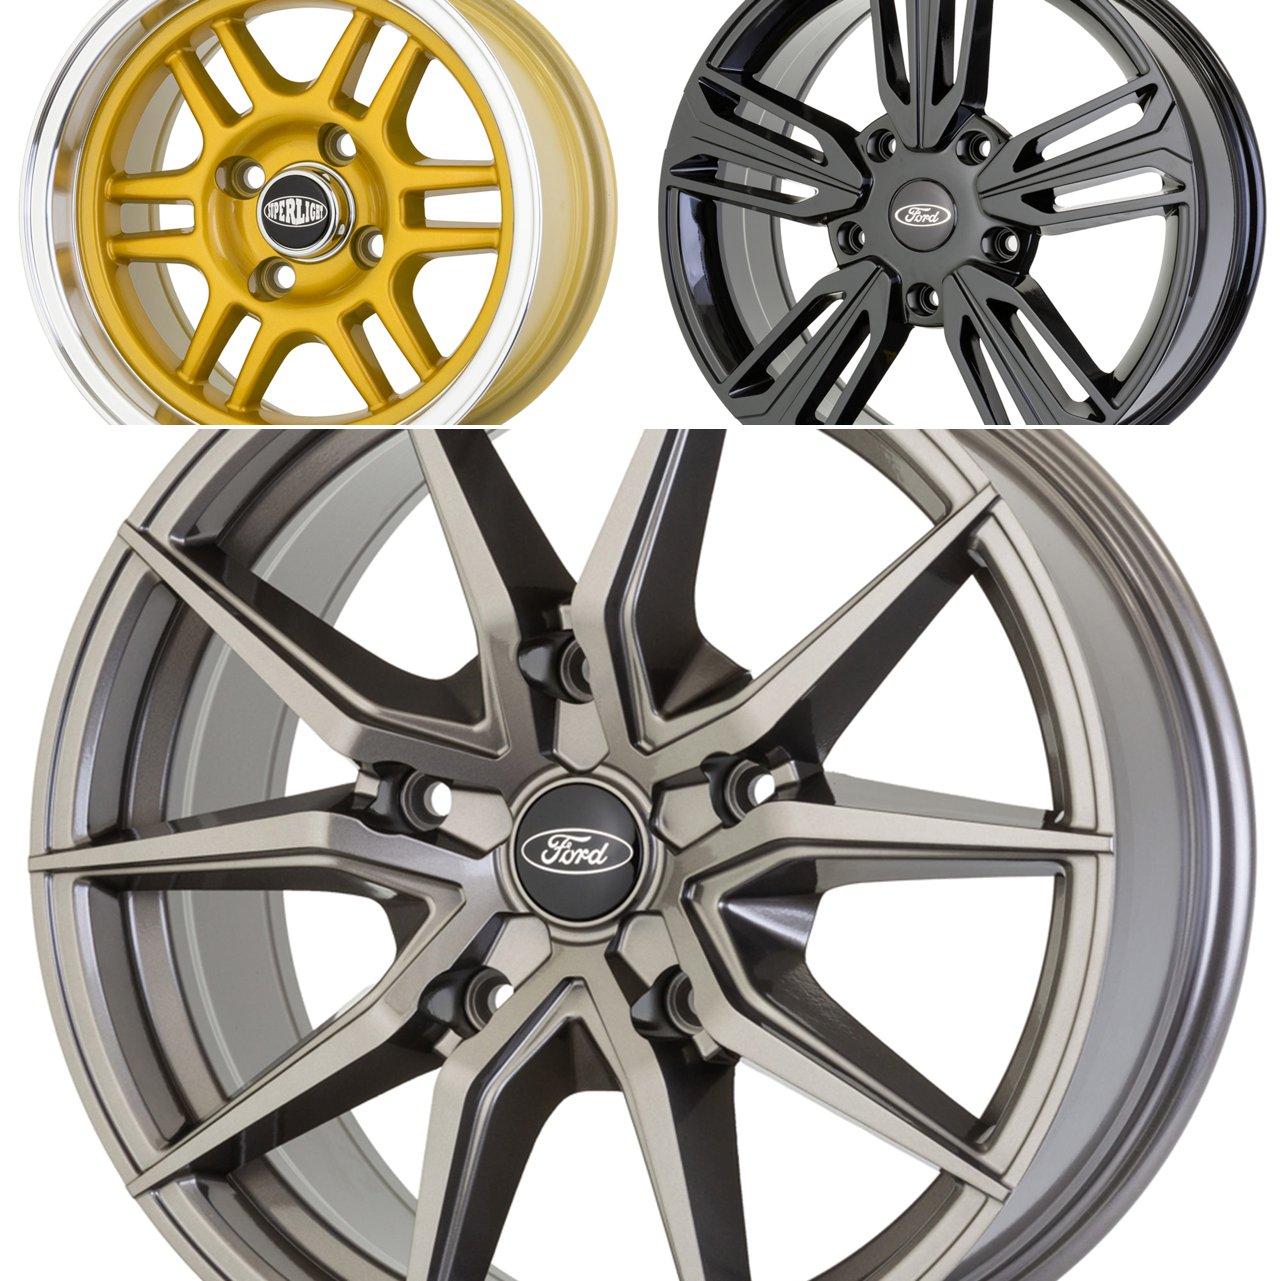 Wheel Product Photography